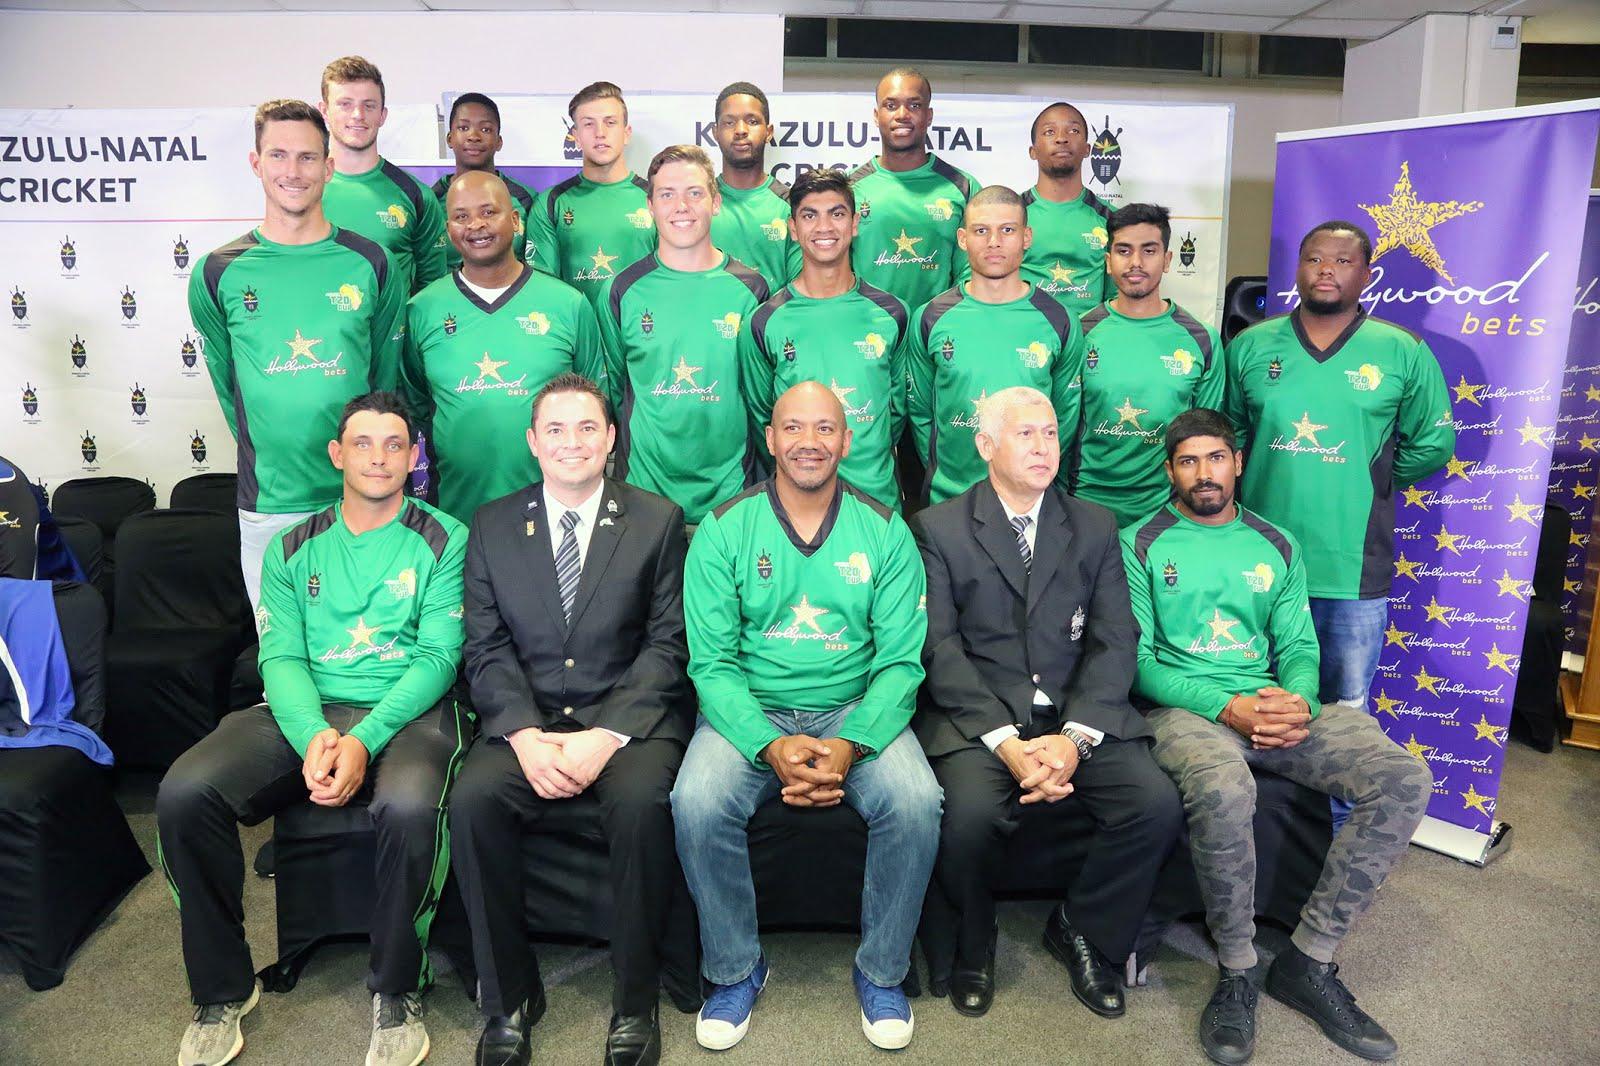 Hollywoodbets KZN Coastal Team - Africa T20 Cup - Team Photo - Vaughn van Jaarsveld - Roger Telemachus - Prenelan Subrayen - Calvin Savage - Heinrich Strydom